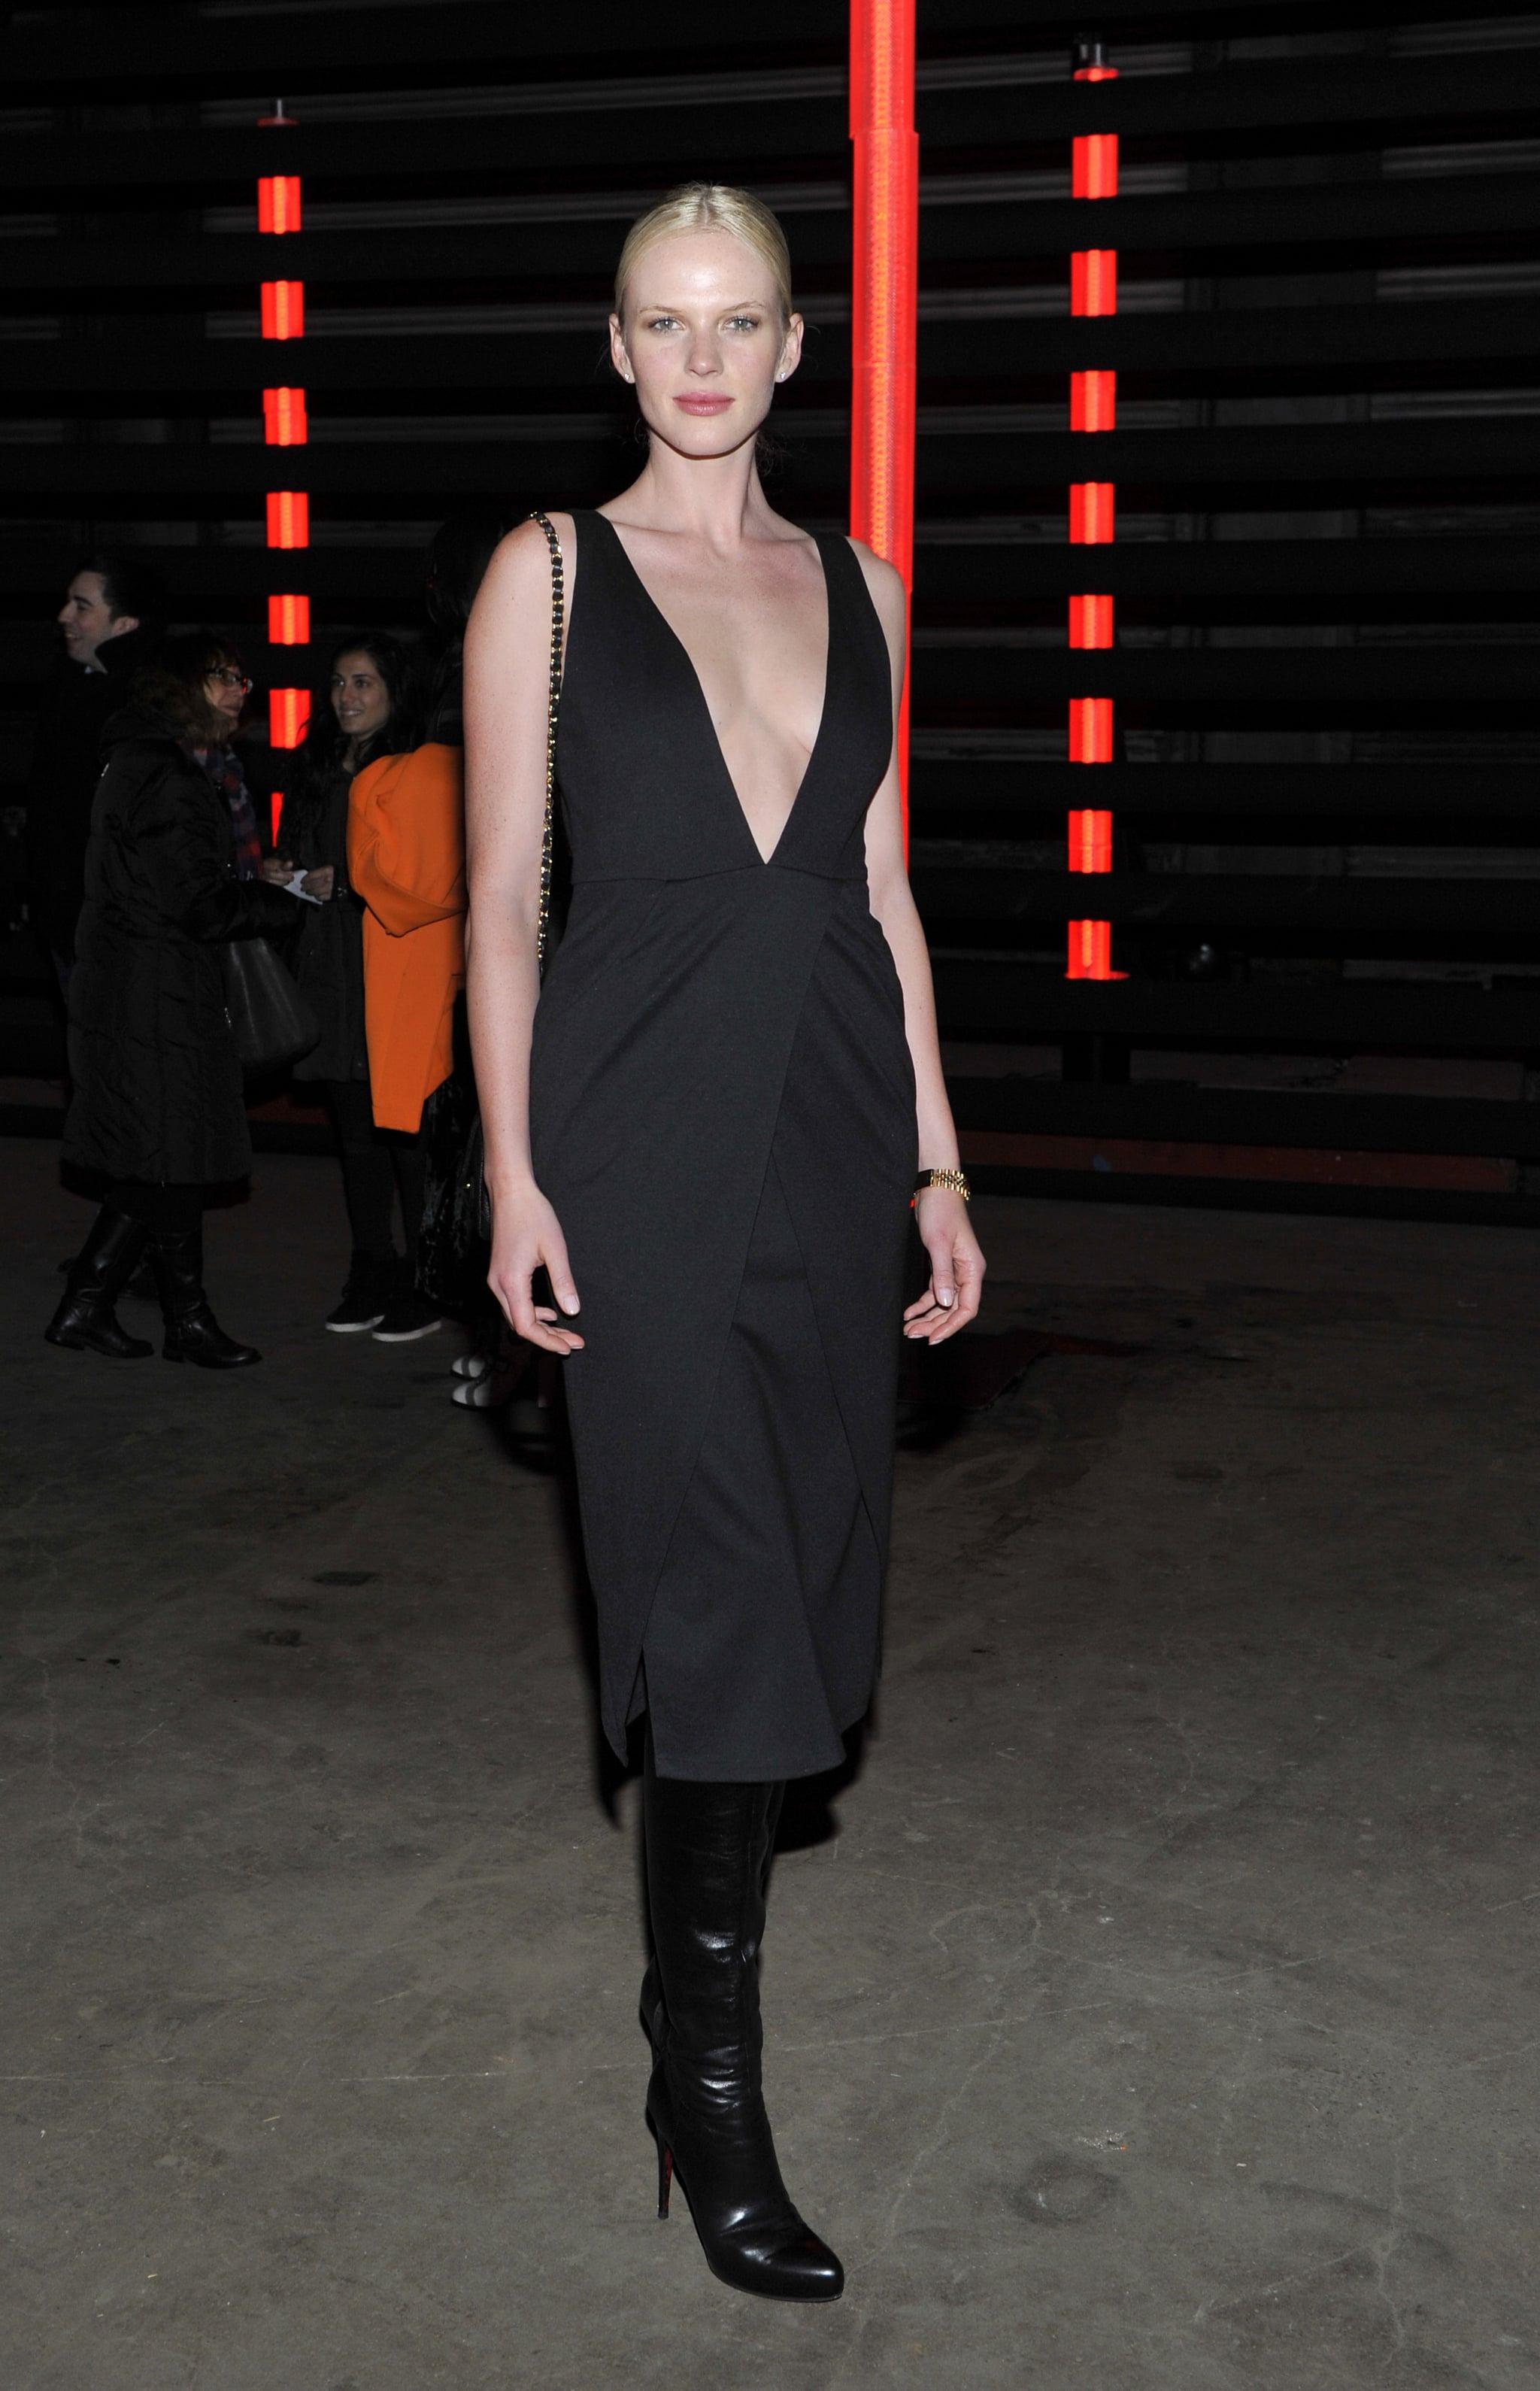 détaillant en ligne 40454 c93ff Anne Vyalitsyna's plunging black dress was juxtaposed via ...